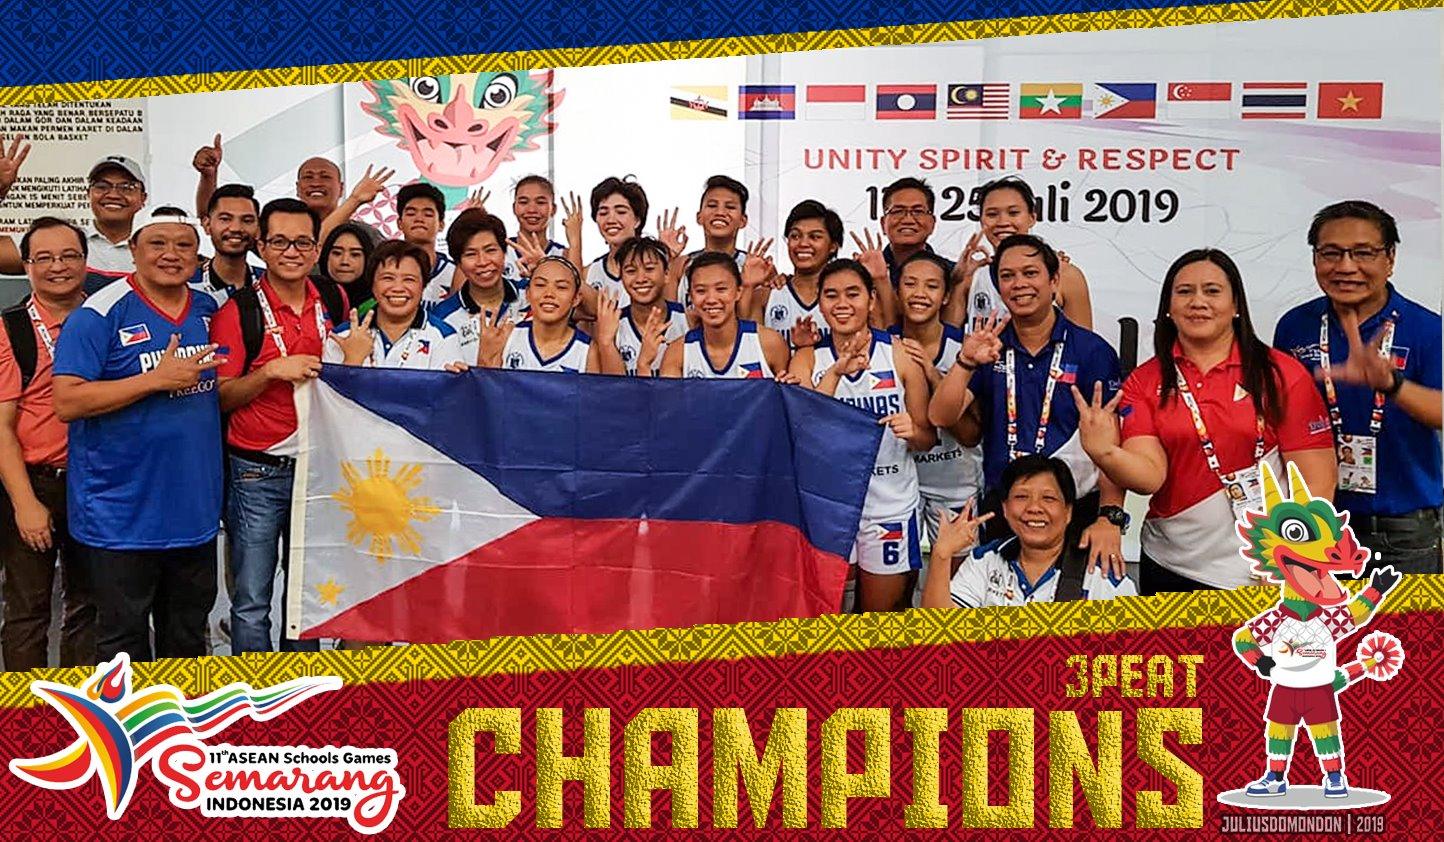 Philippines Boys Girls Basketball